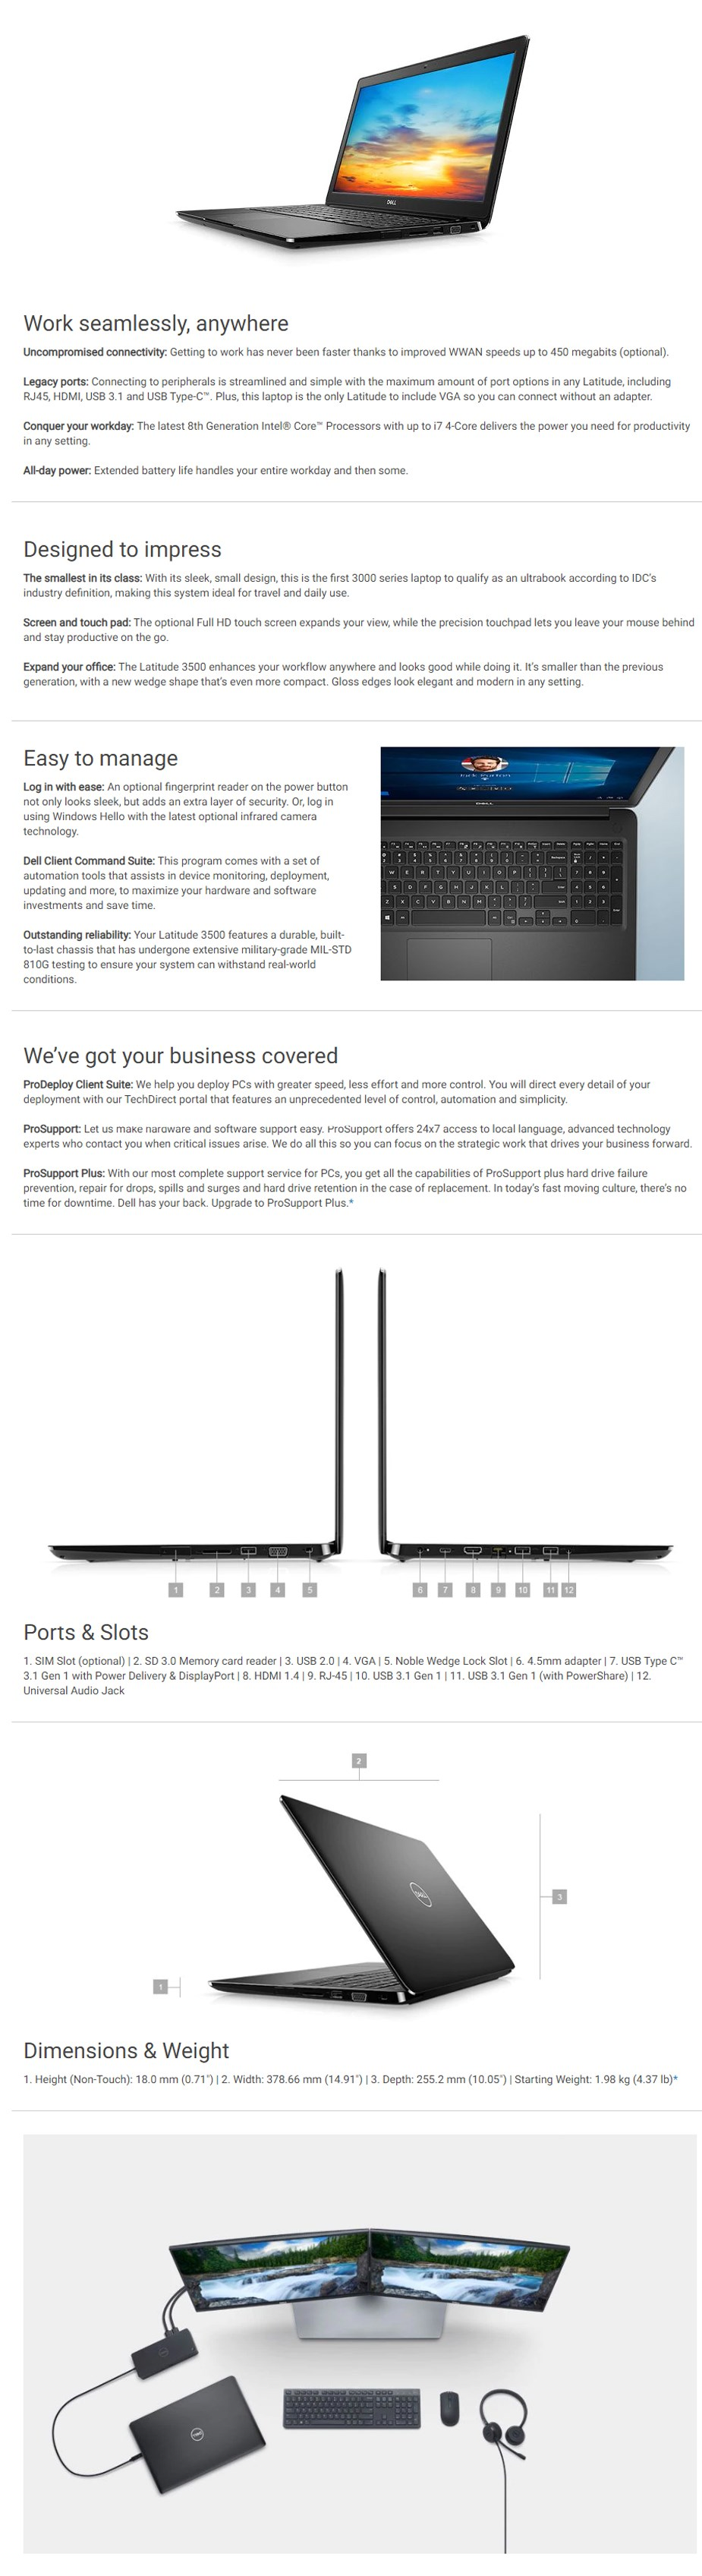 "Dell Latitude 56KX8 15.6"" Laptop i5-8265U 8GB 256GB W10P - Overview 1"